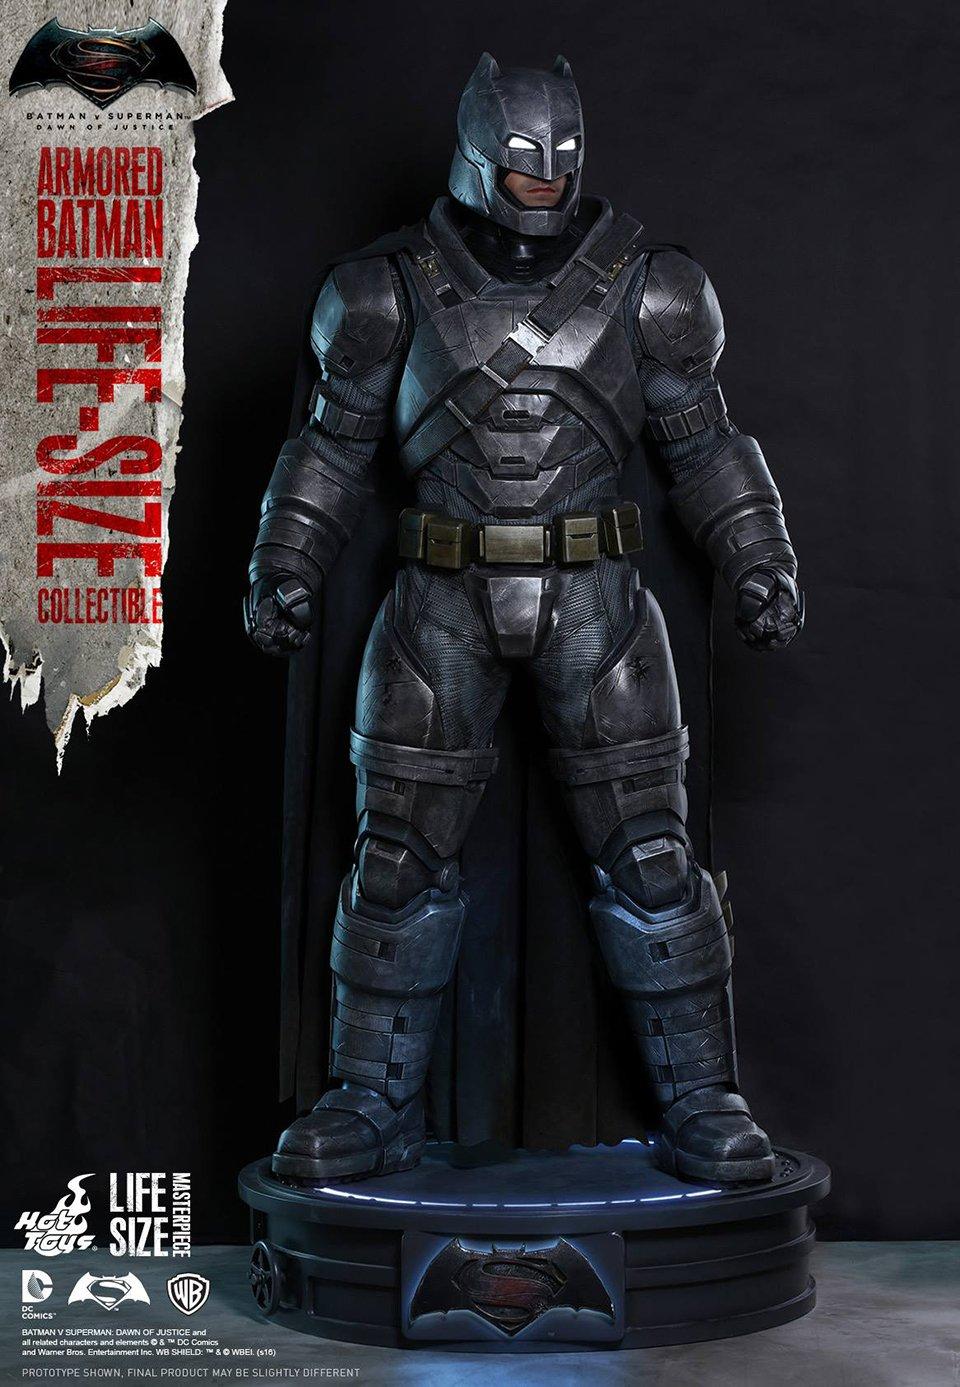 hot toys bvs armored batman lifesize statue mightymega